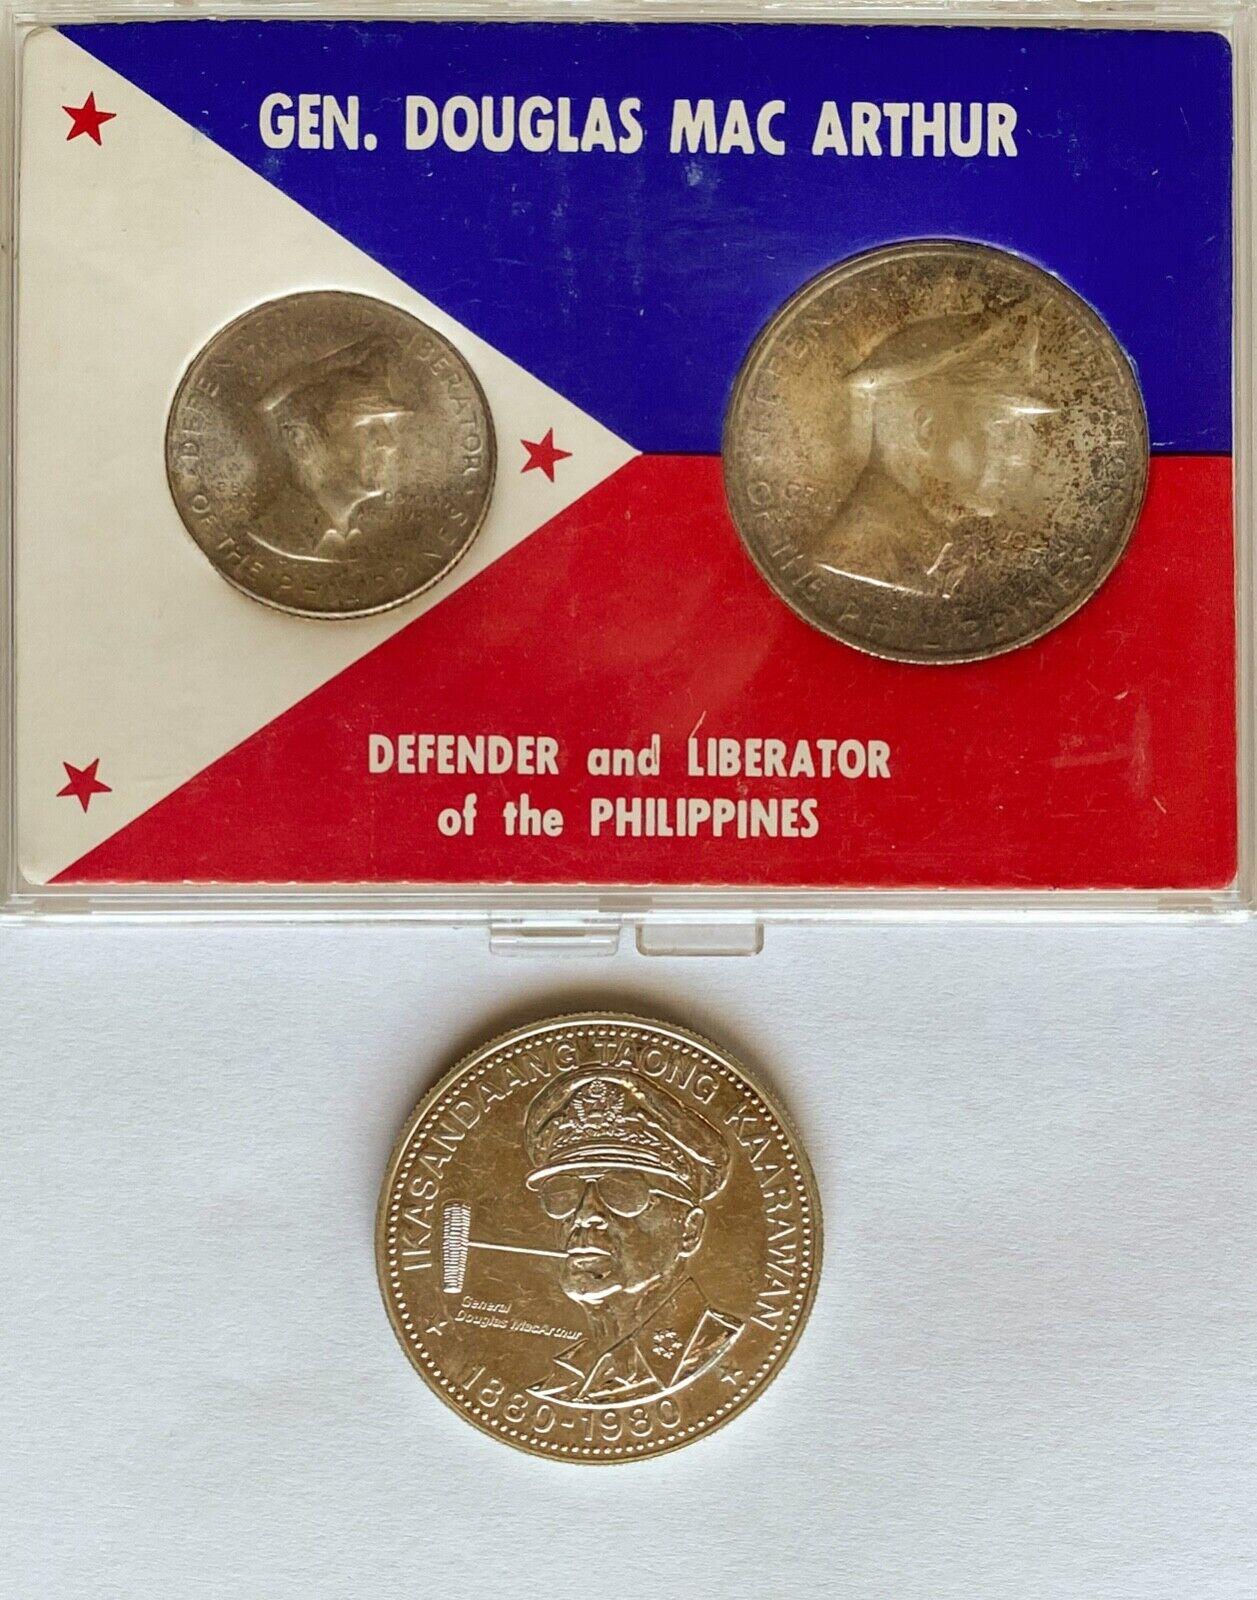 MacArthur, Philippines 1947-S 1 Peso, 1947-S 50 Centavo, 1982 25 Piso - $89.00